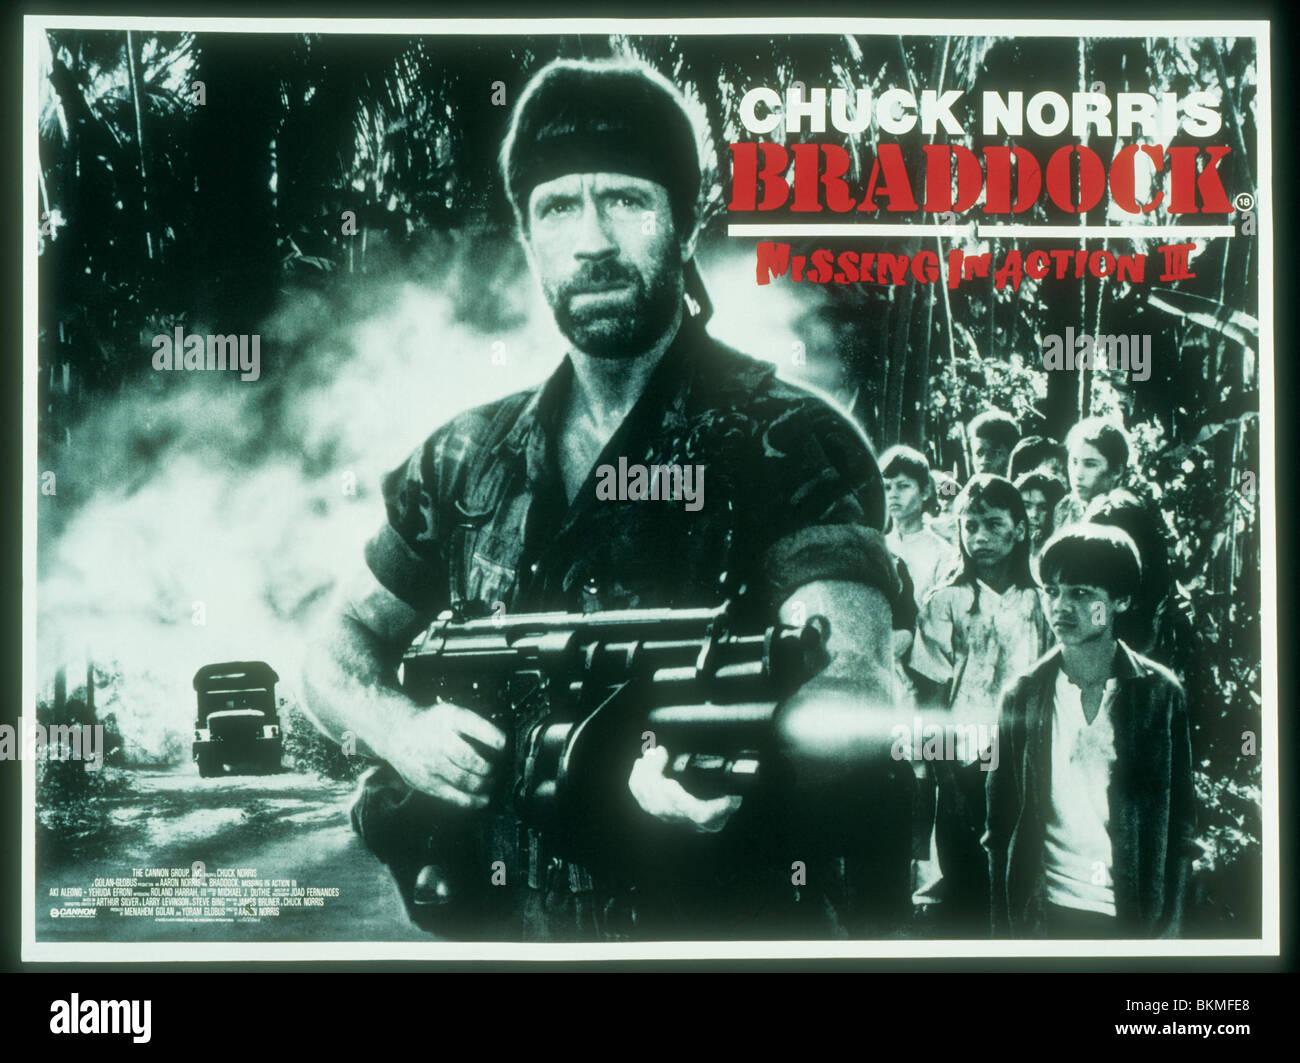 BRADDOCK: MISSING IN ACTION 3 (1988) POSTER BRDK 002